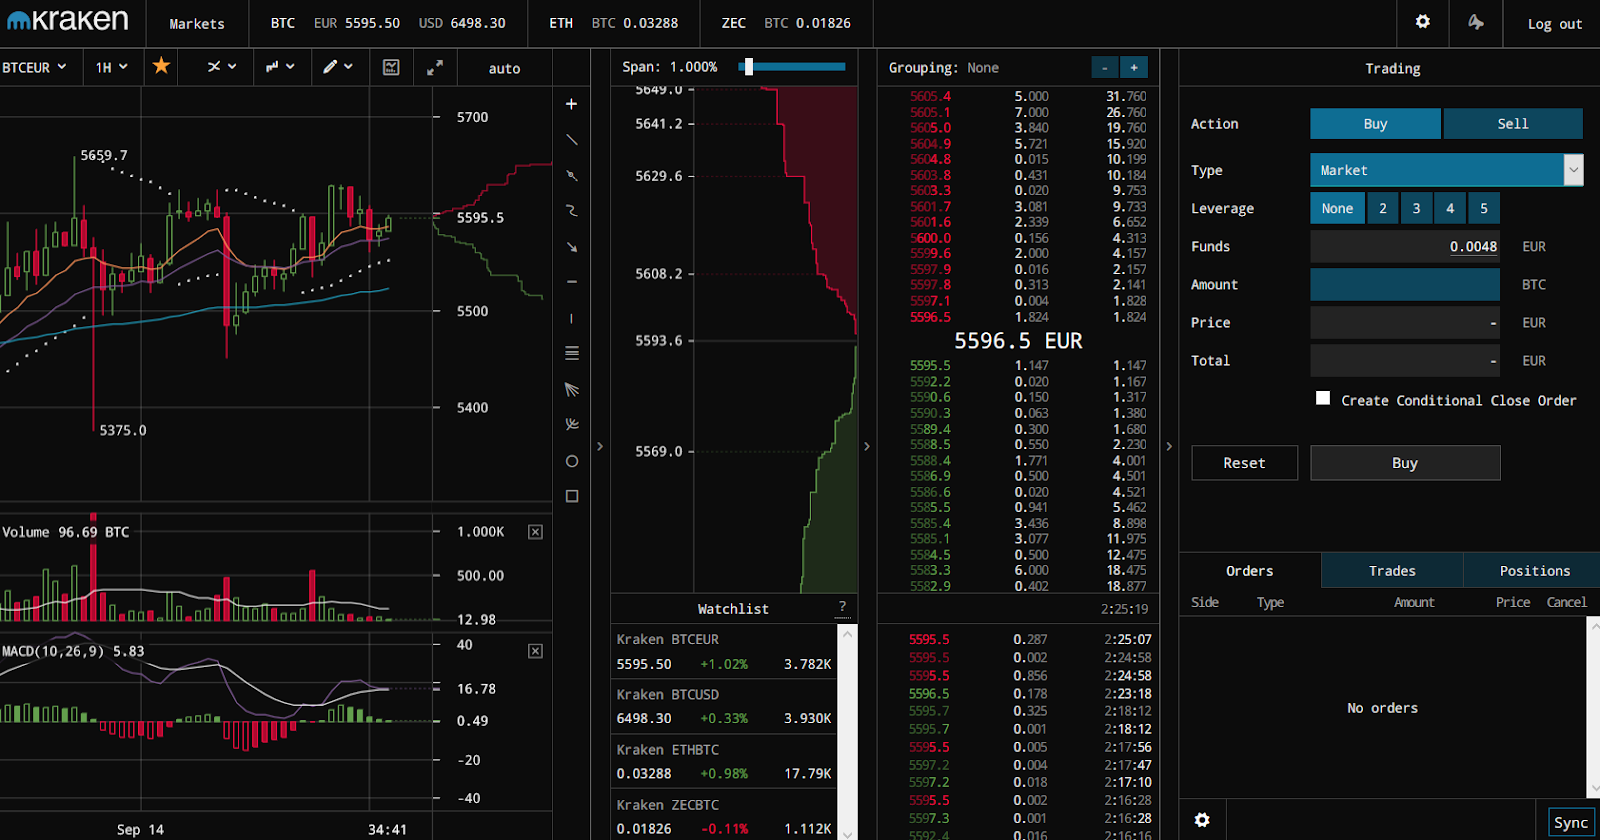 Bitcoin News: Kraken: An Overview of One of Europe's Top Bitcoin